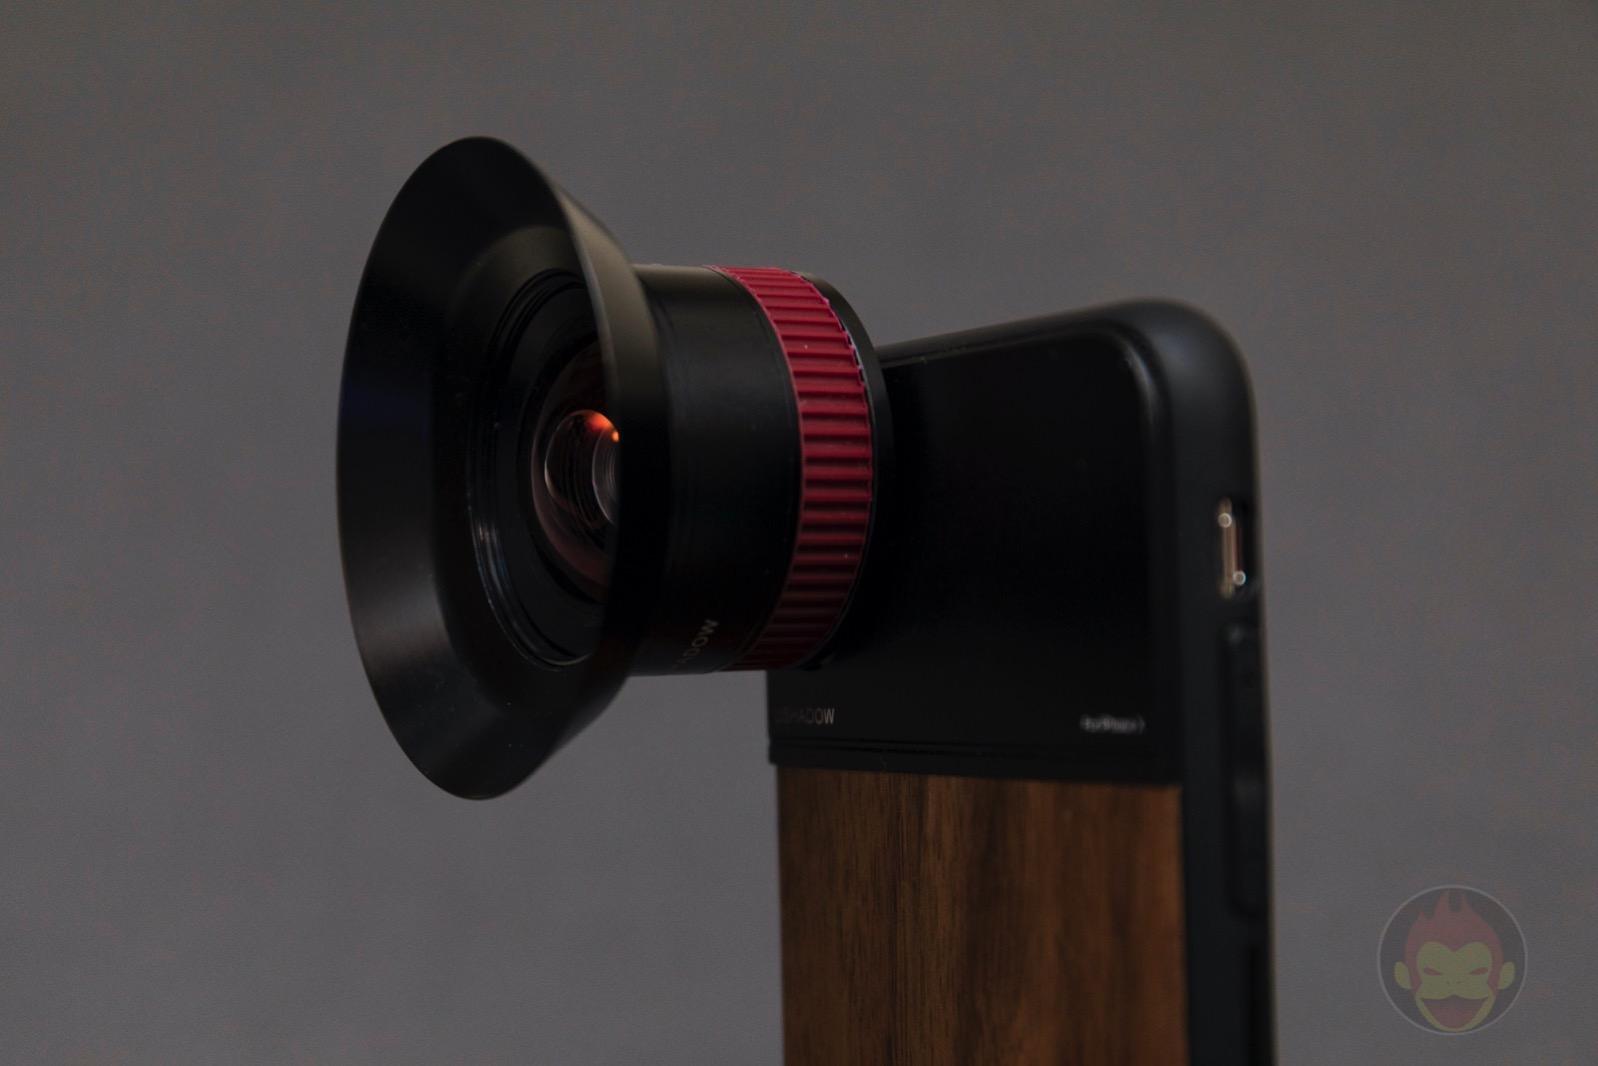 USHADOW-X1-Lens-System-Review-13.jpg